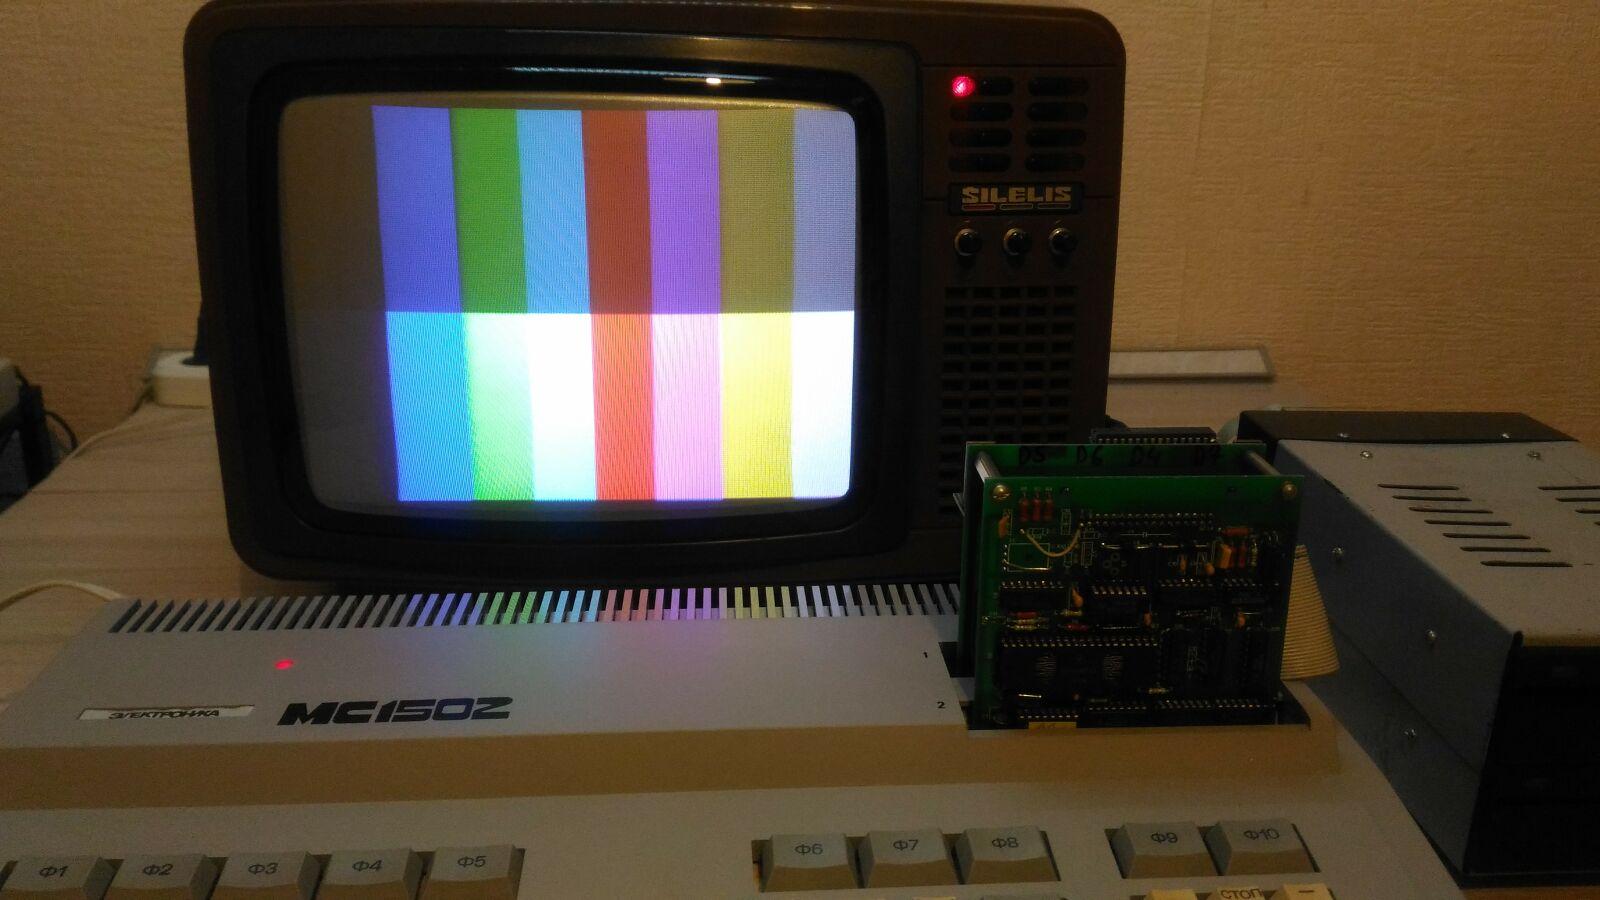 Советская IBM-PC Электроника МС-1502 - 16